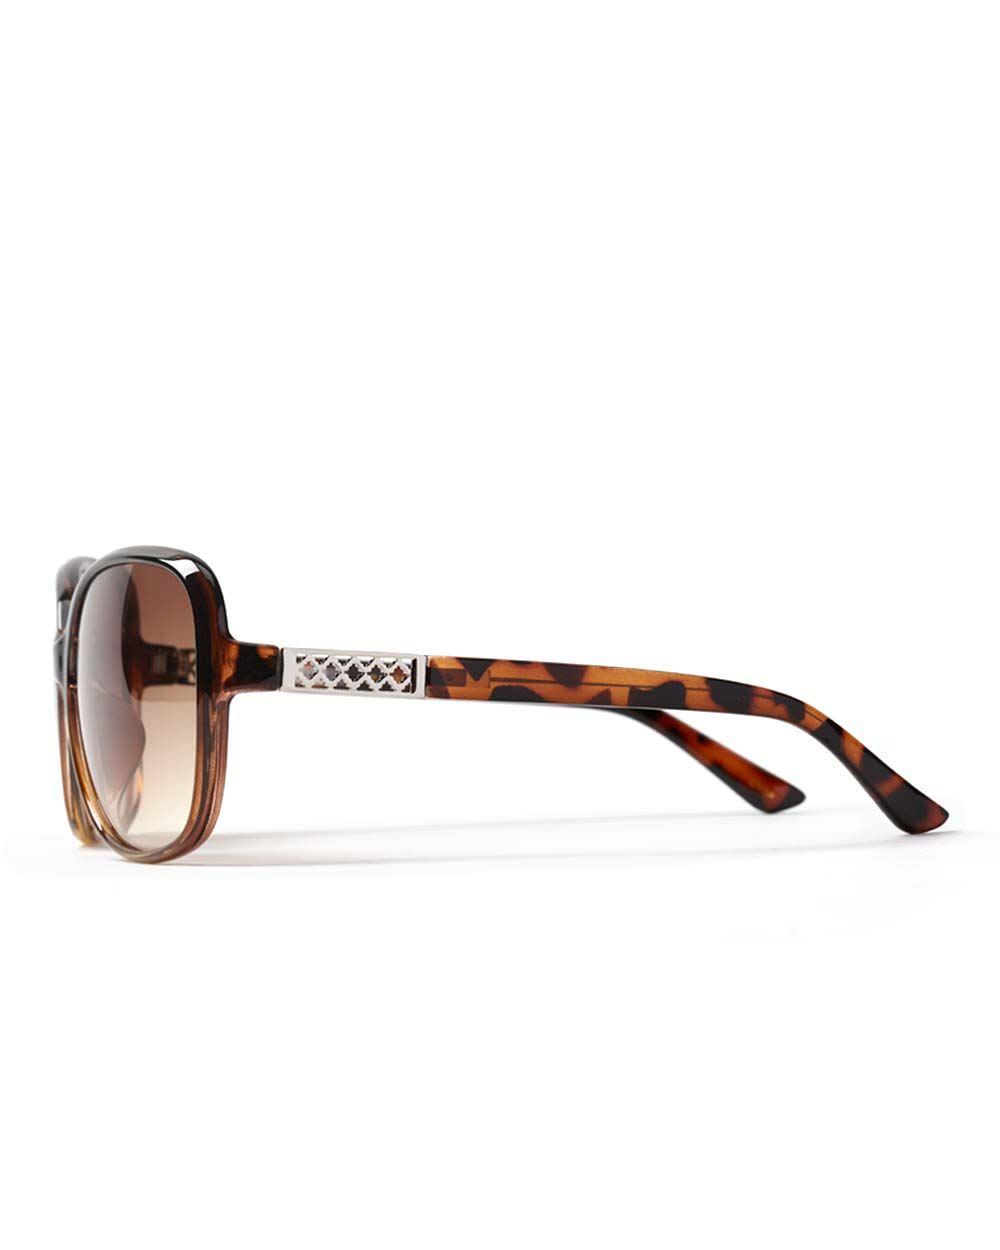 Sunglasses with Metallic Detail